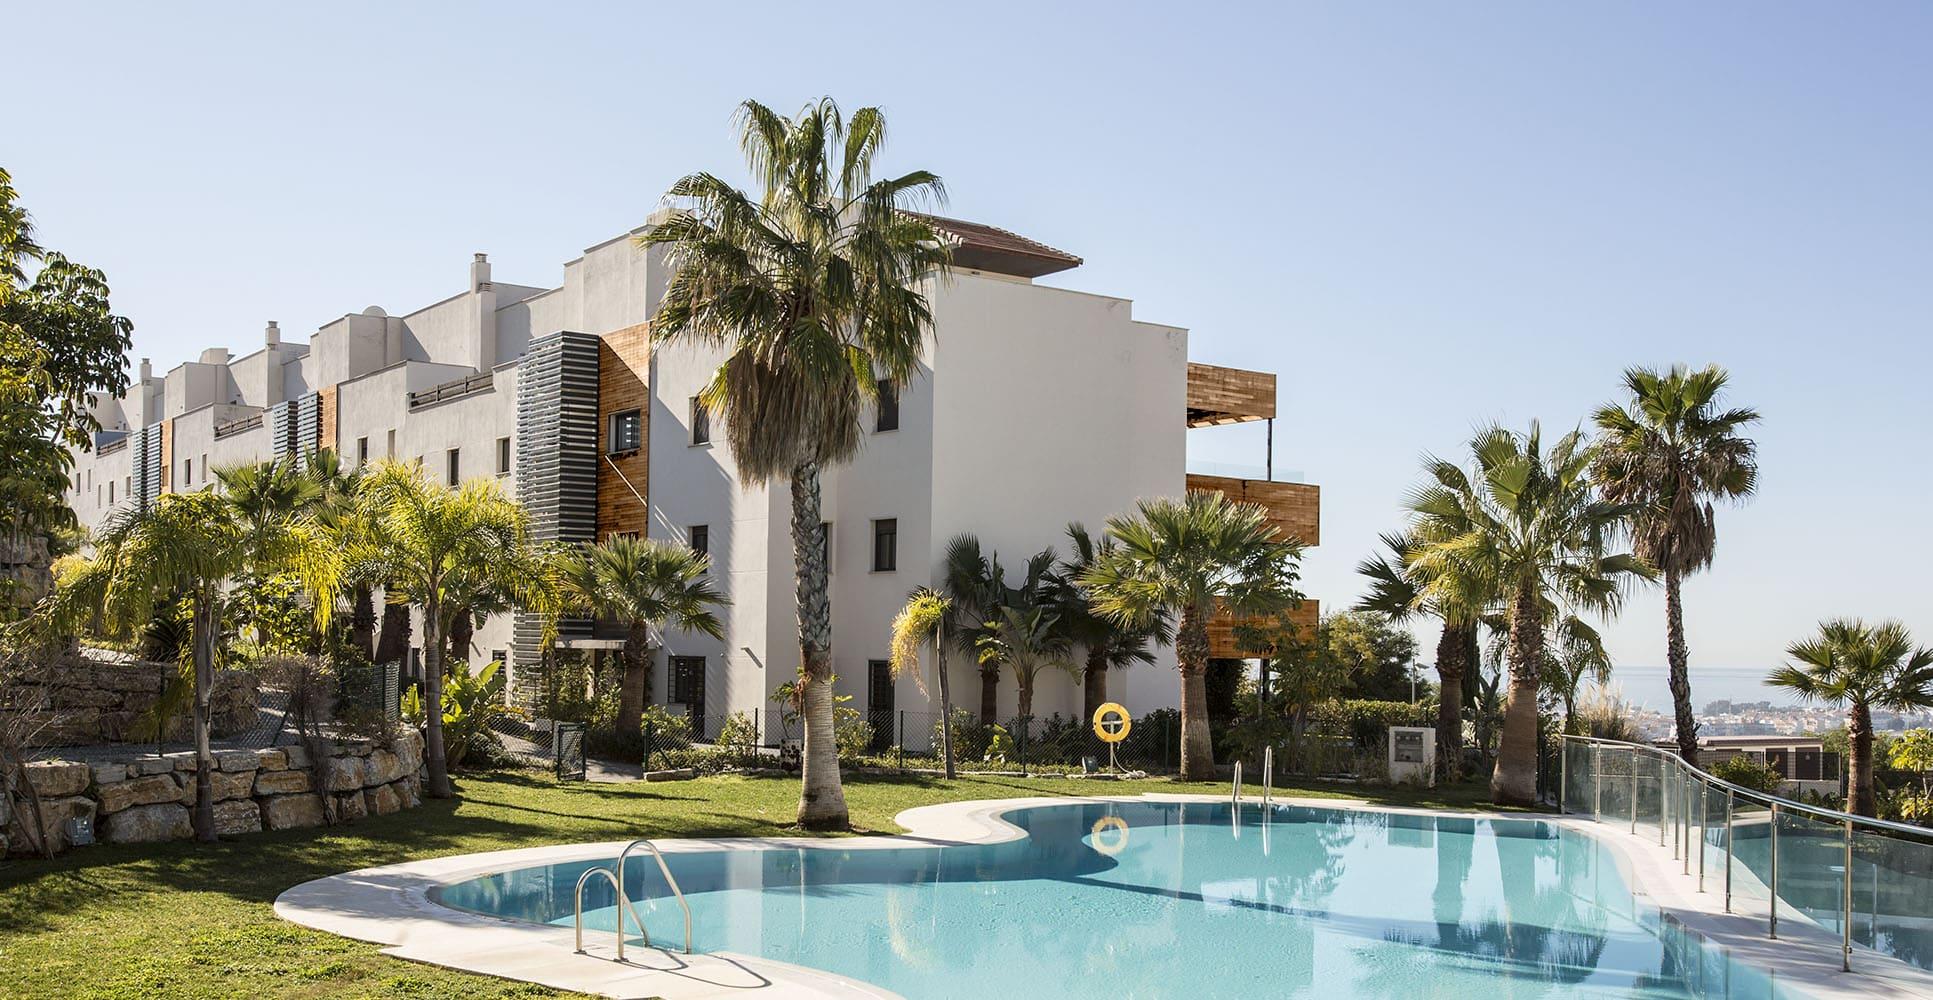 Marbella real estate investment